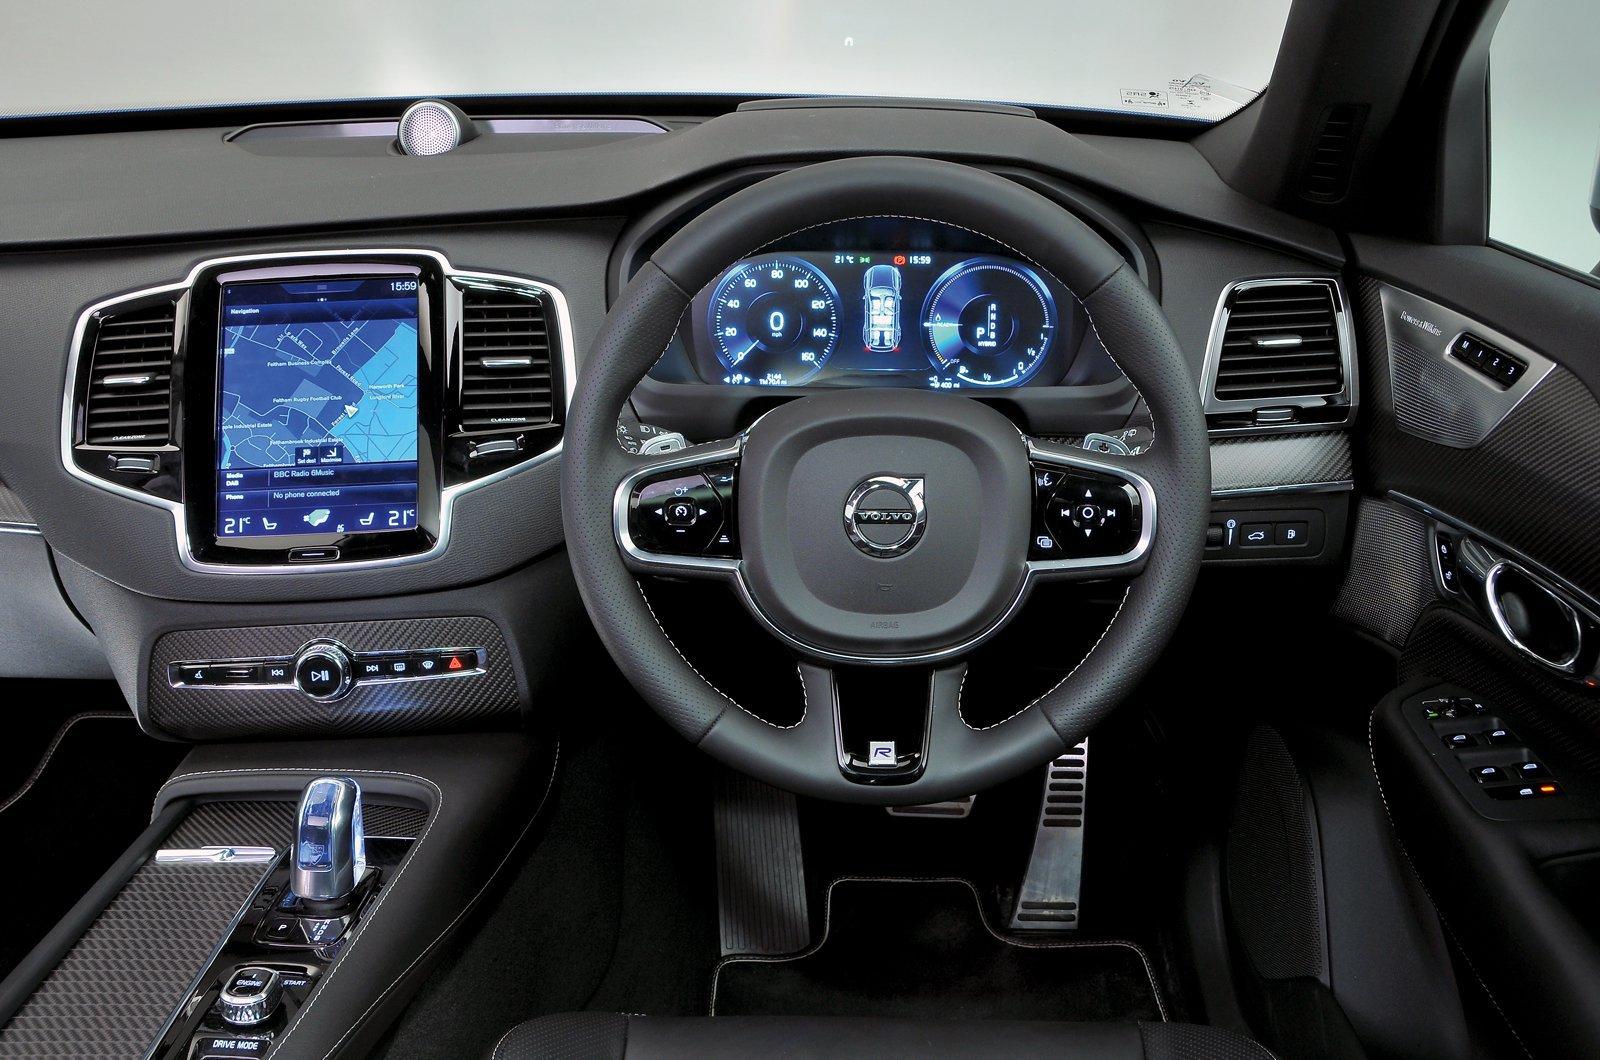 Volvo XC90 2.0 T8 Inscription Geartronic - interior